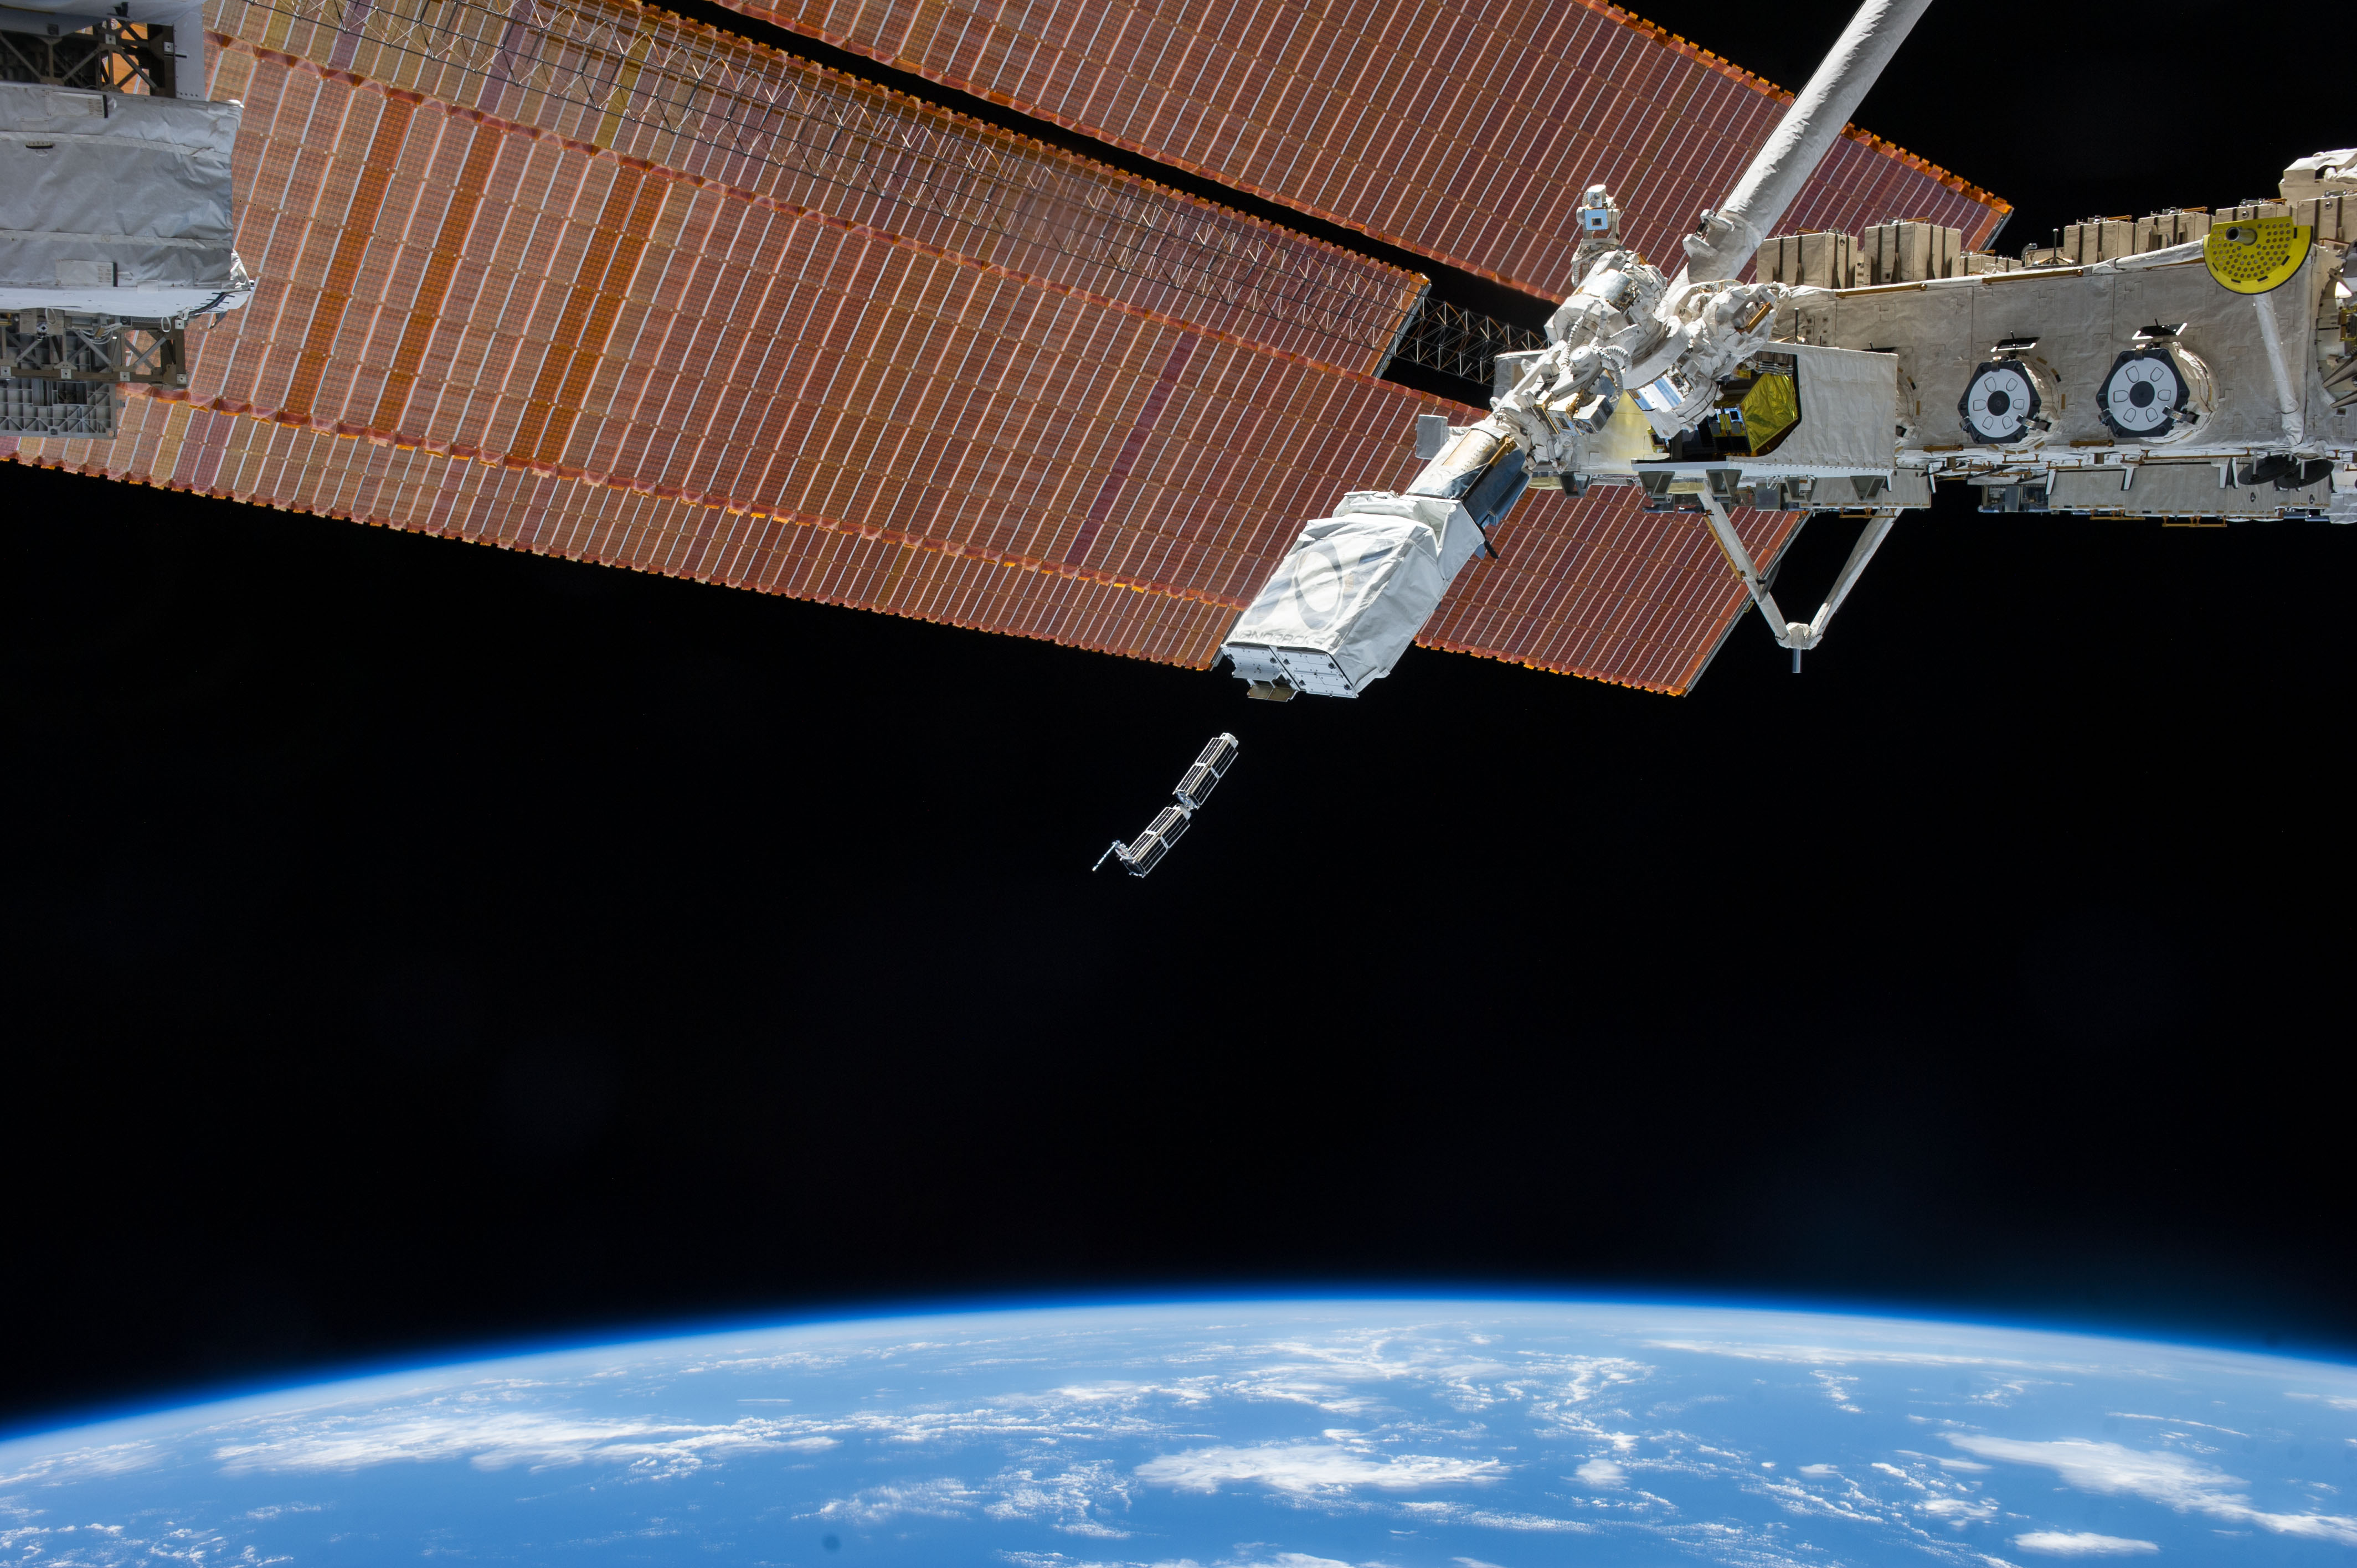 satellite and spacecraft - photo #16